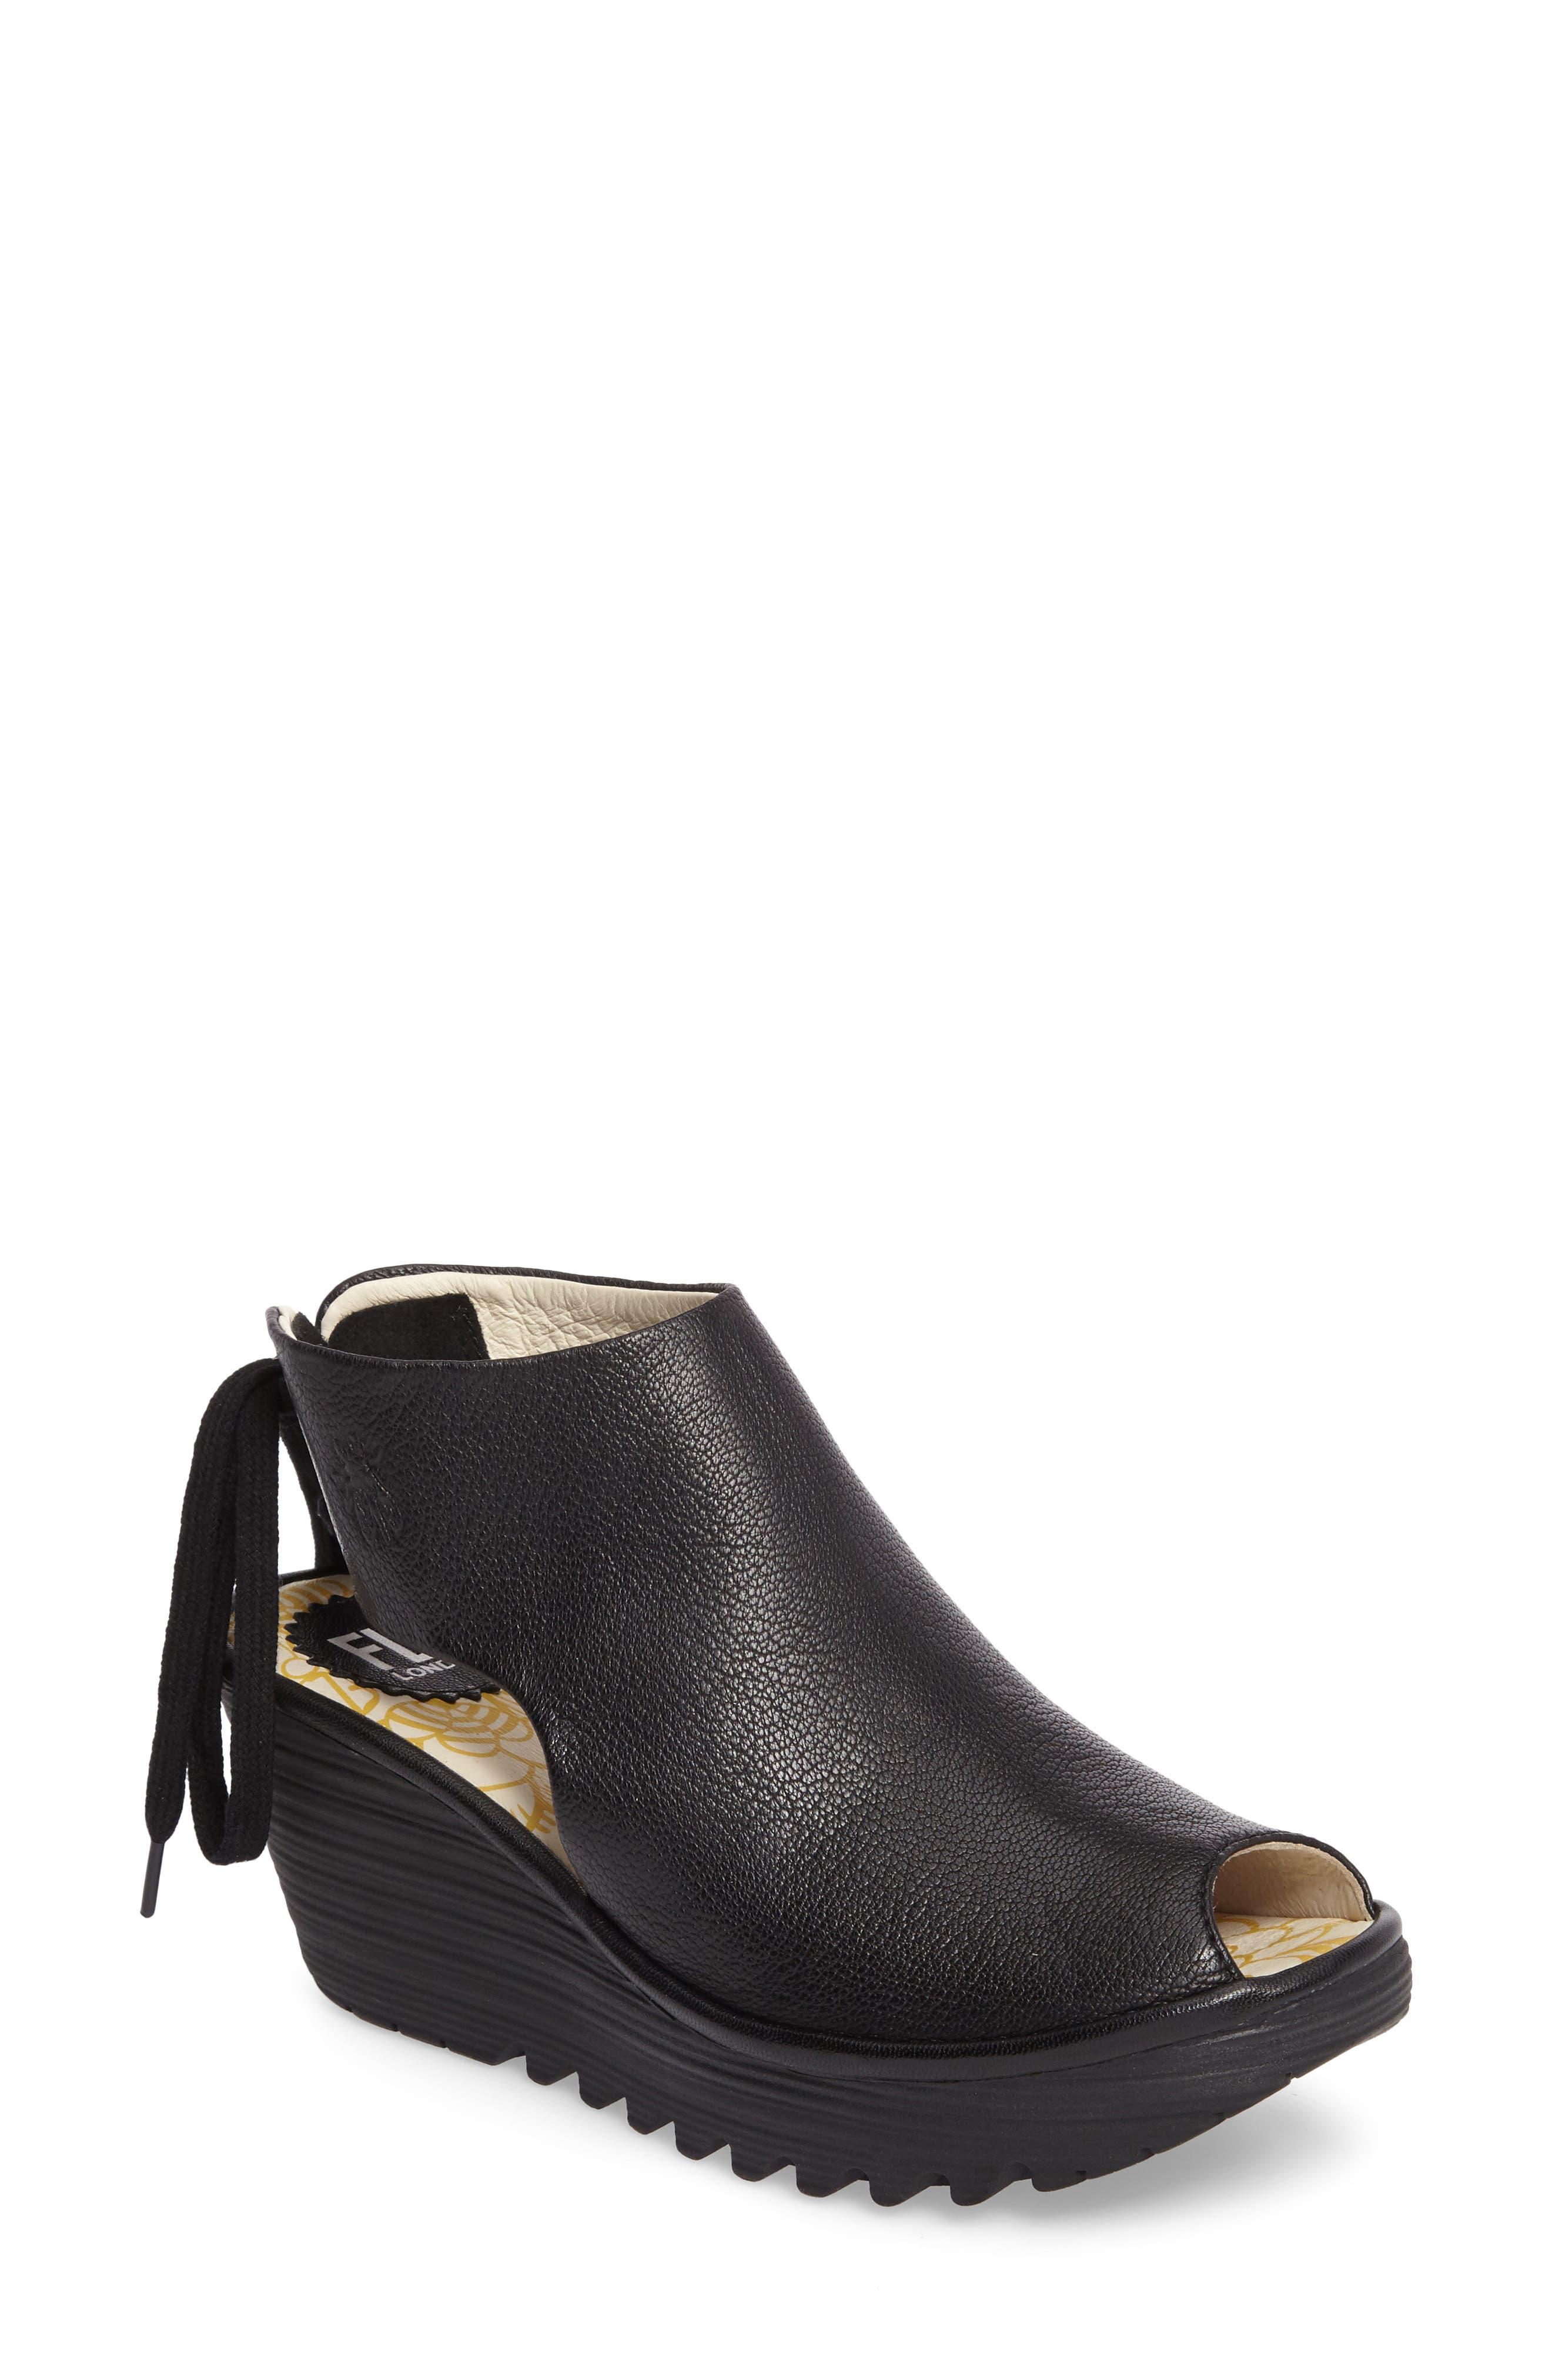 Yuzu Wedge Sandal,                         Main,                         color, Black Mousse Leather